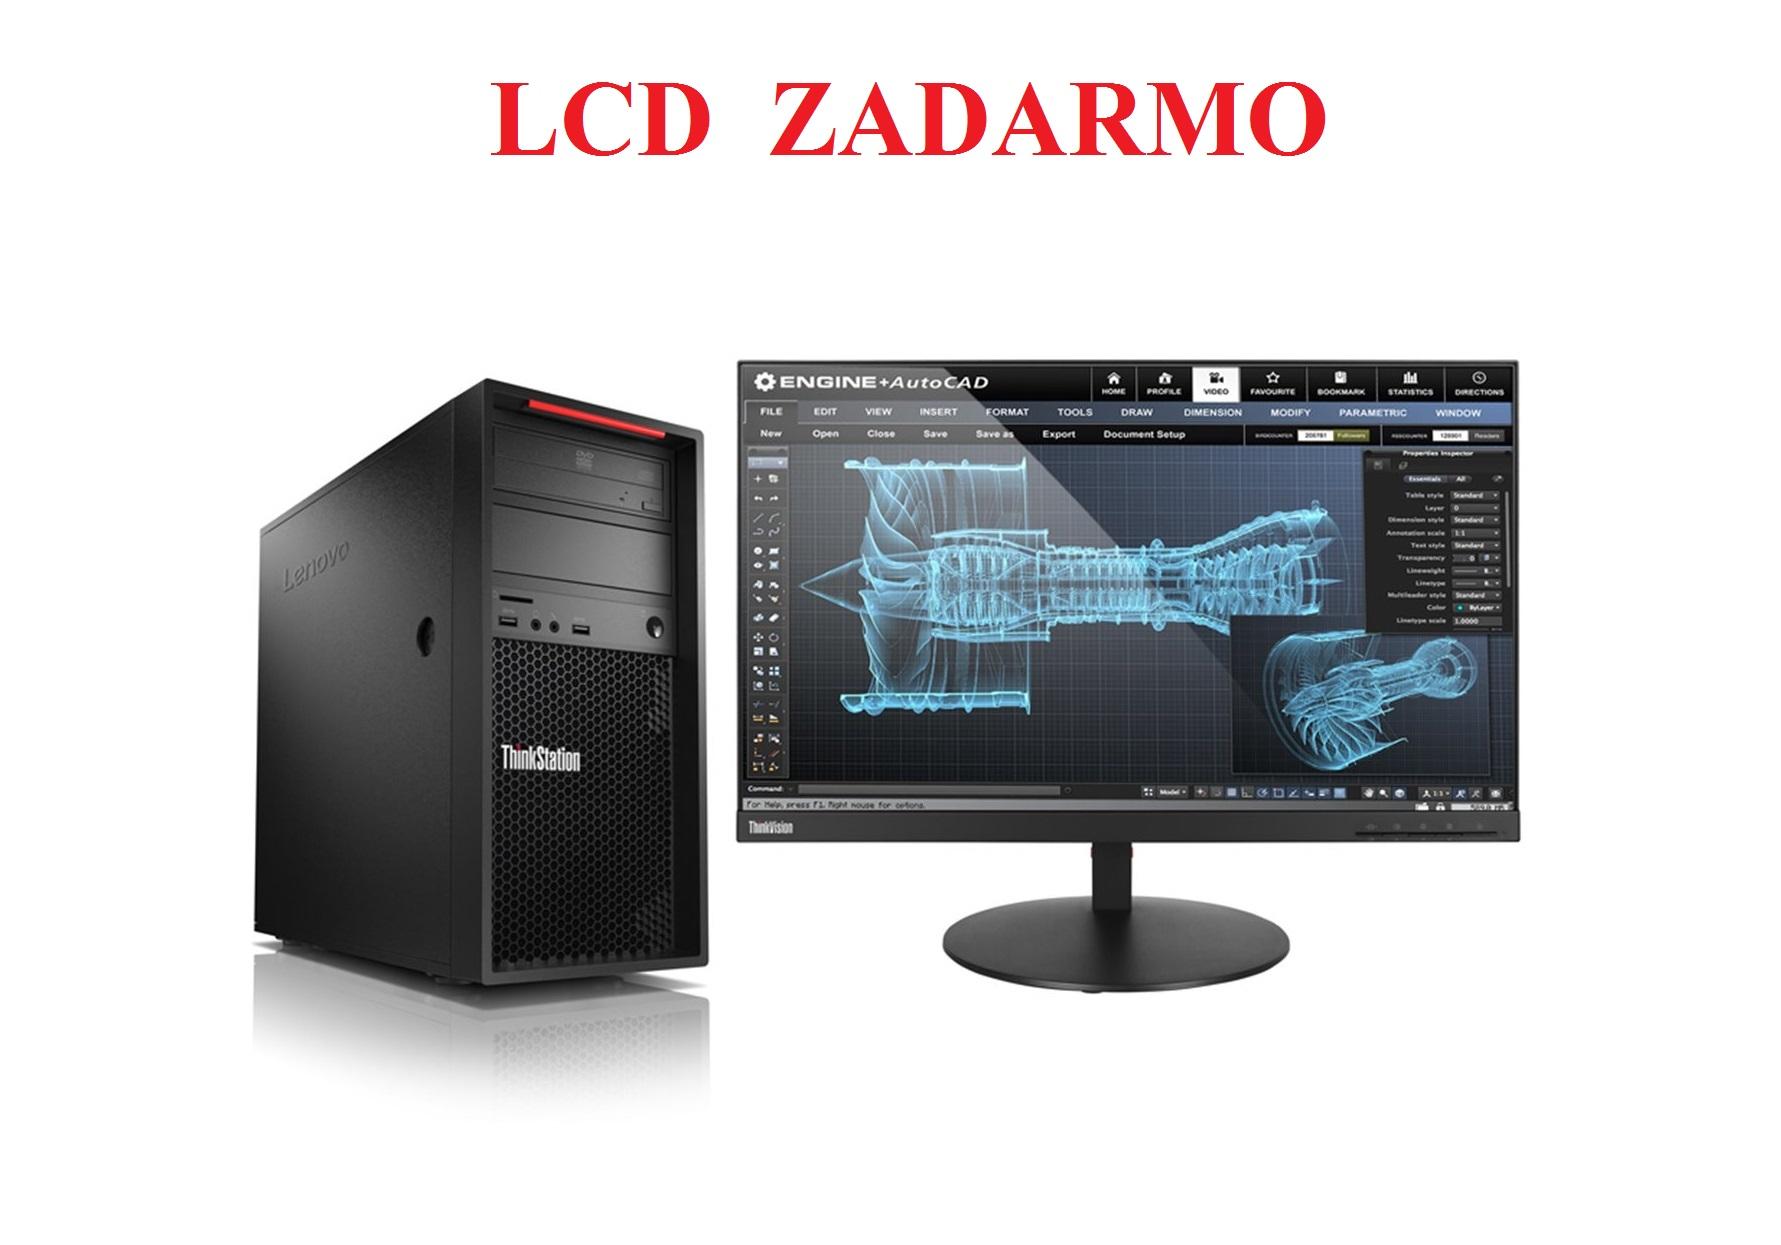 TS P920 TWR/2x Xeon4116/64GB/256+1T/P4000/DVD/W10P+LCD ZADARMO